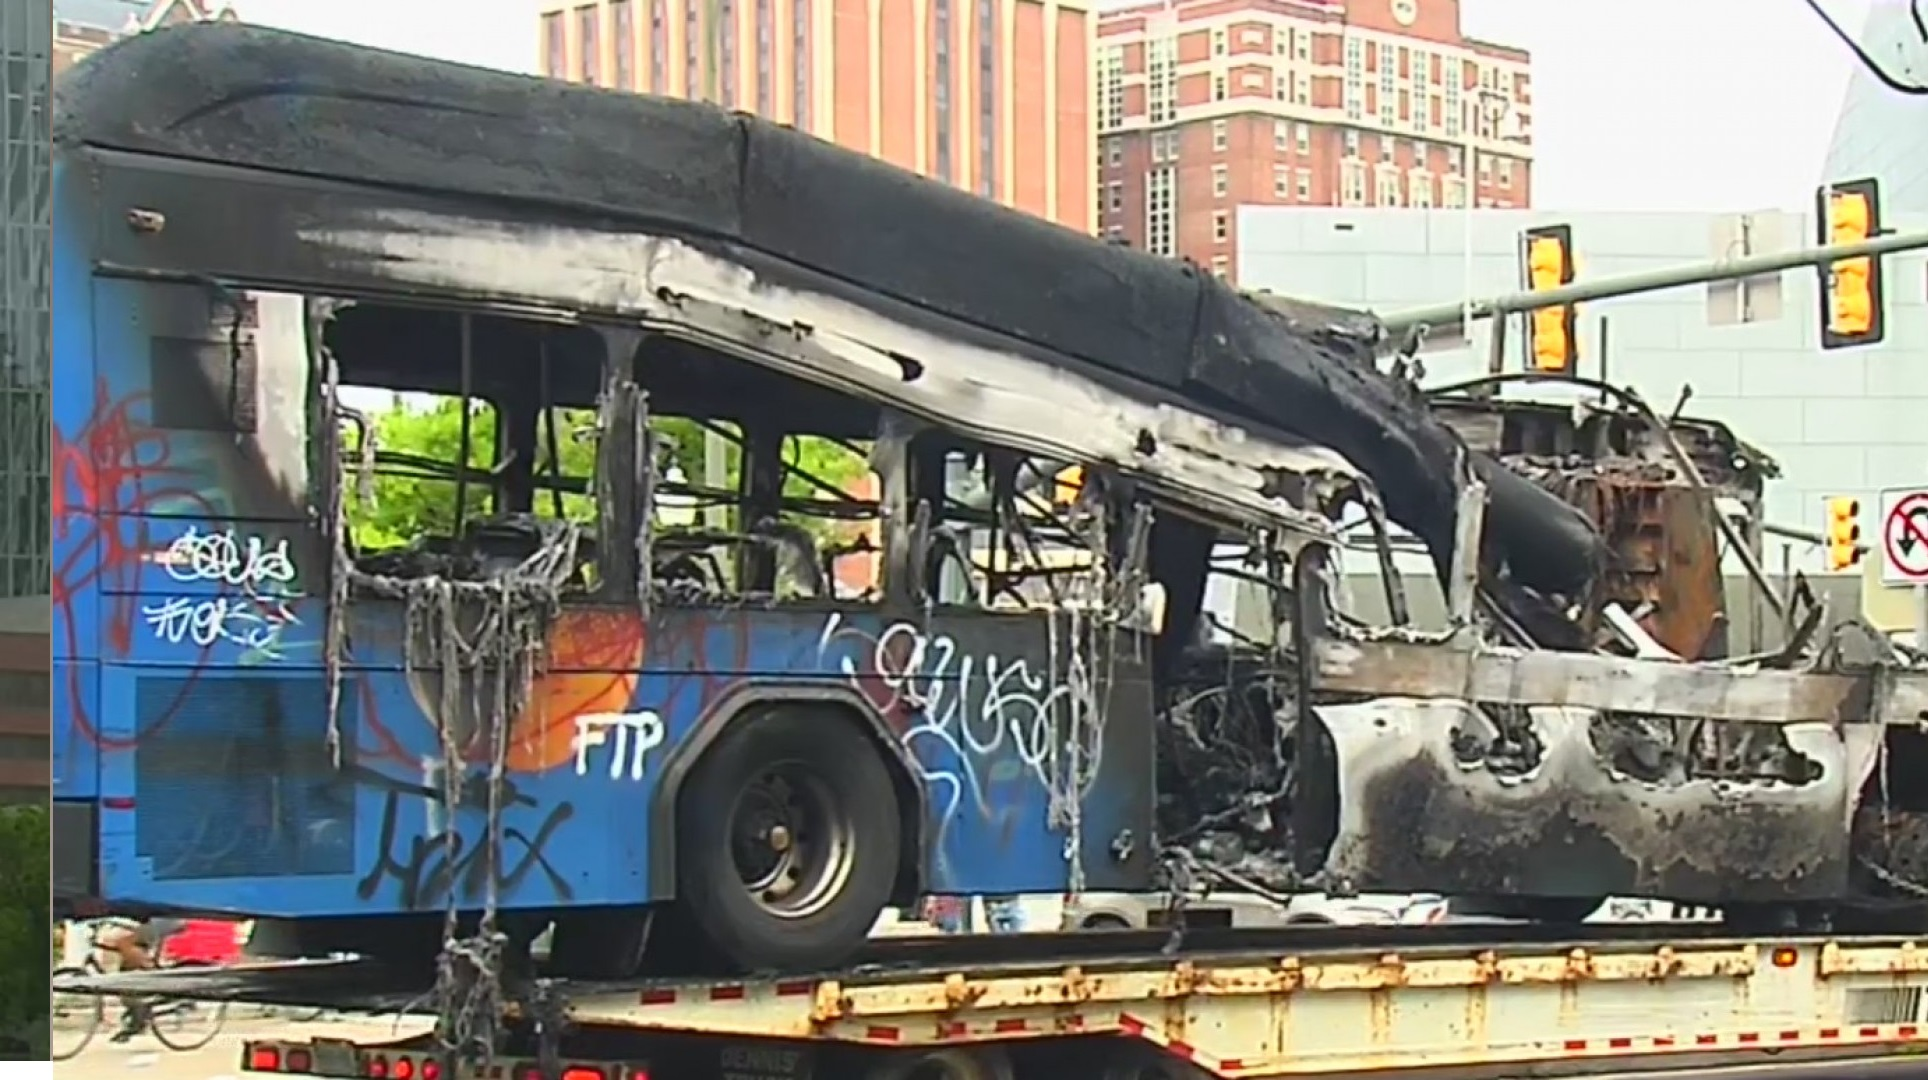 Burnt GRTC Pulse bus on broad street